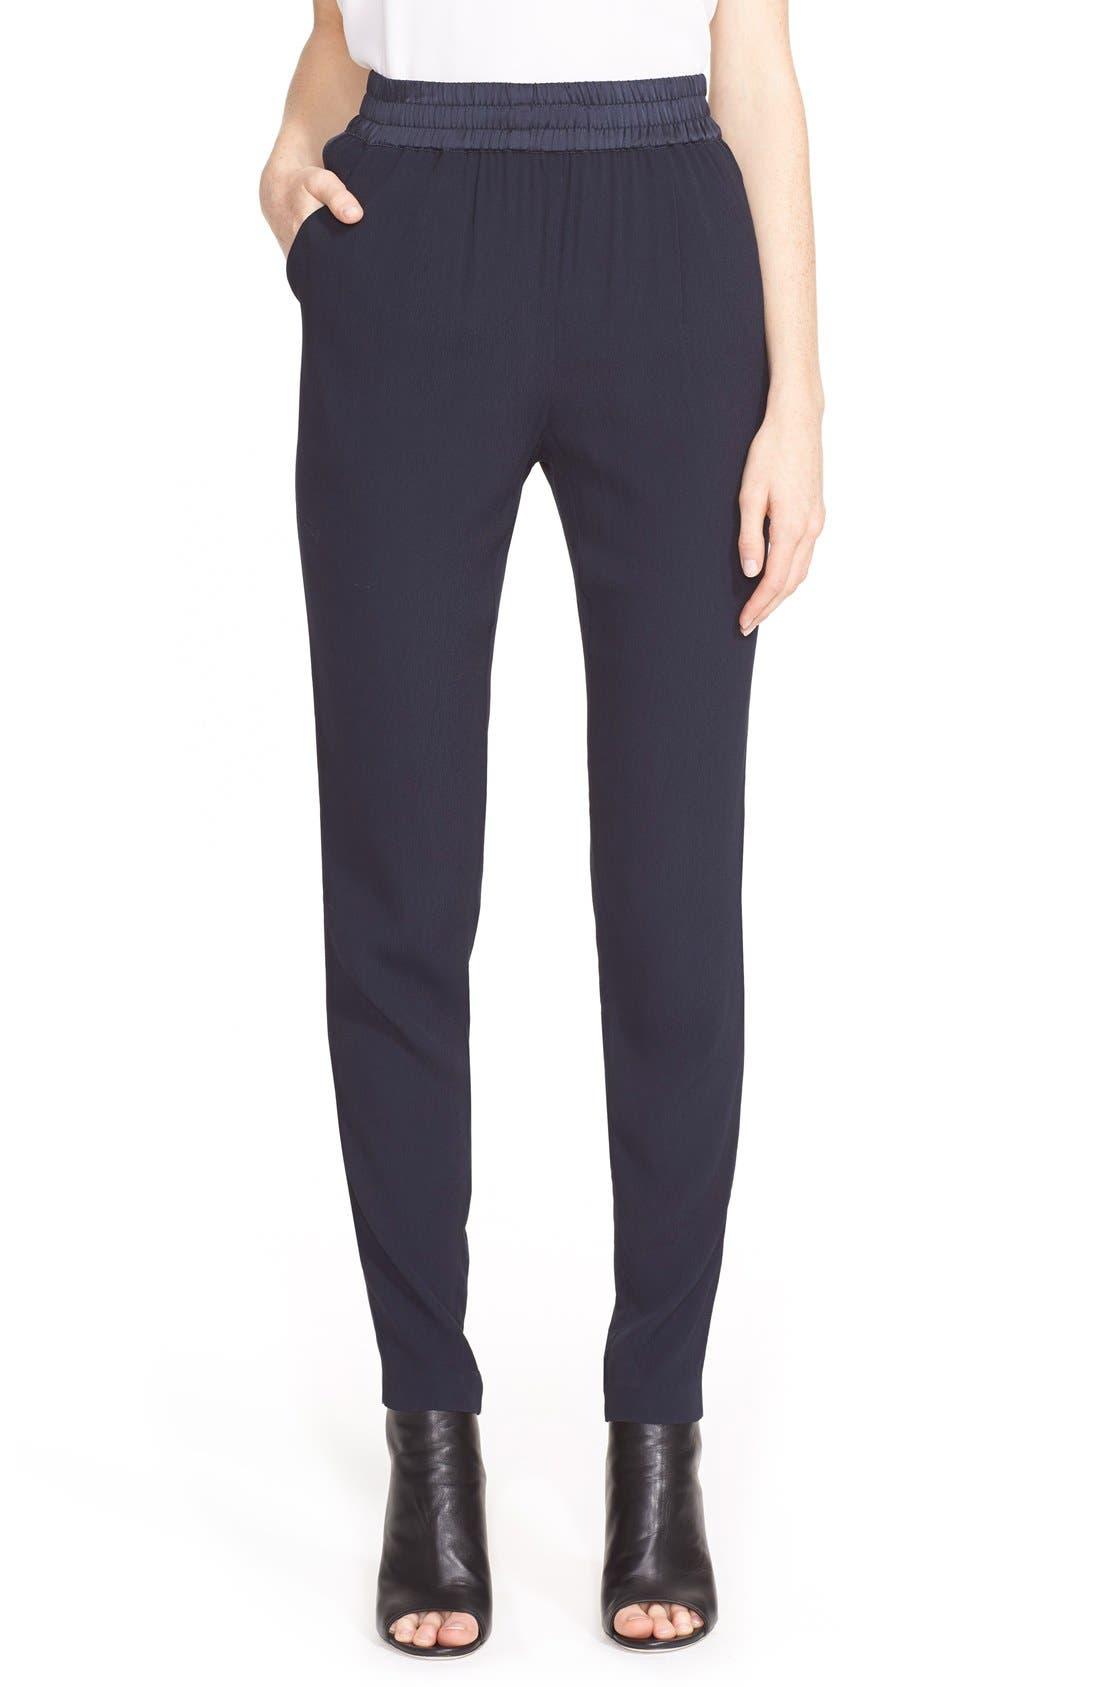 Alternate Image 1 Selected - Rebecca Taylor 'Emma' Side Stripe Pants